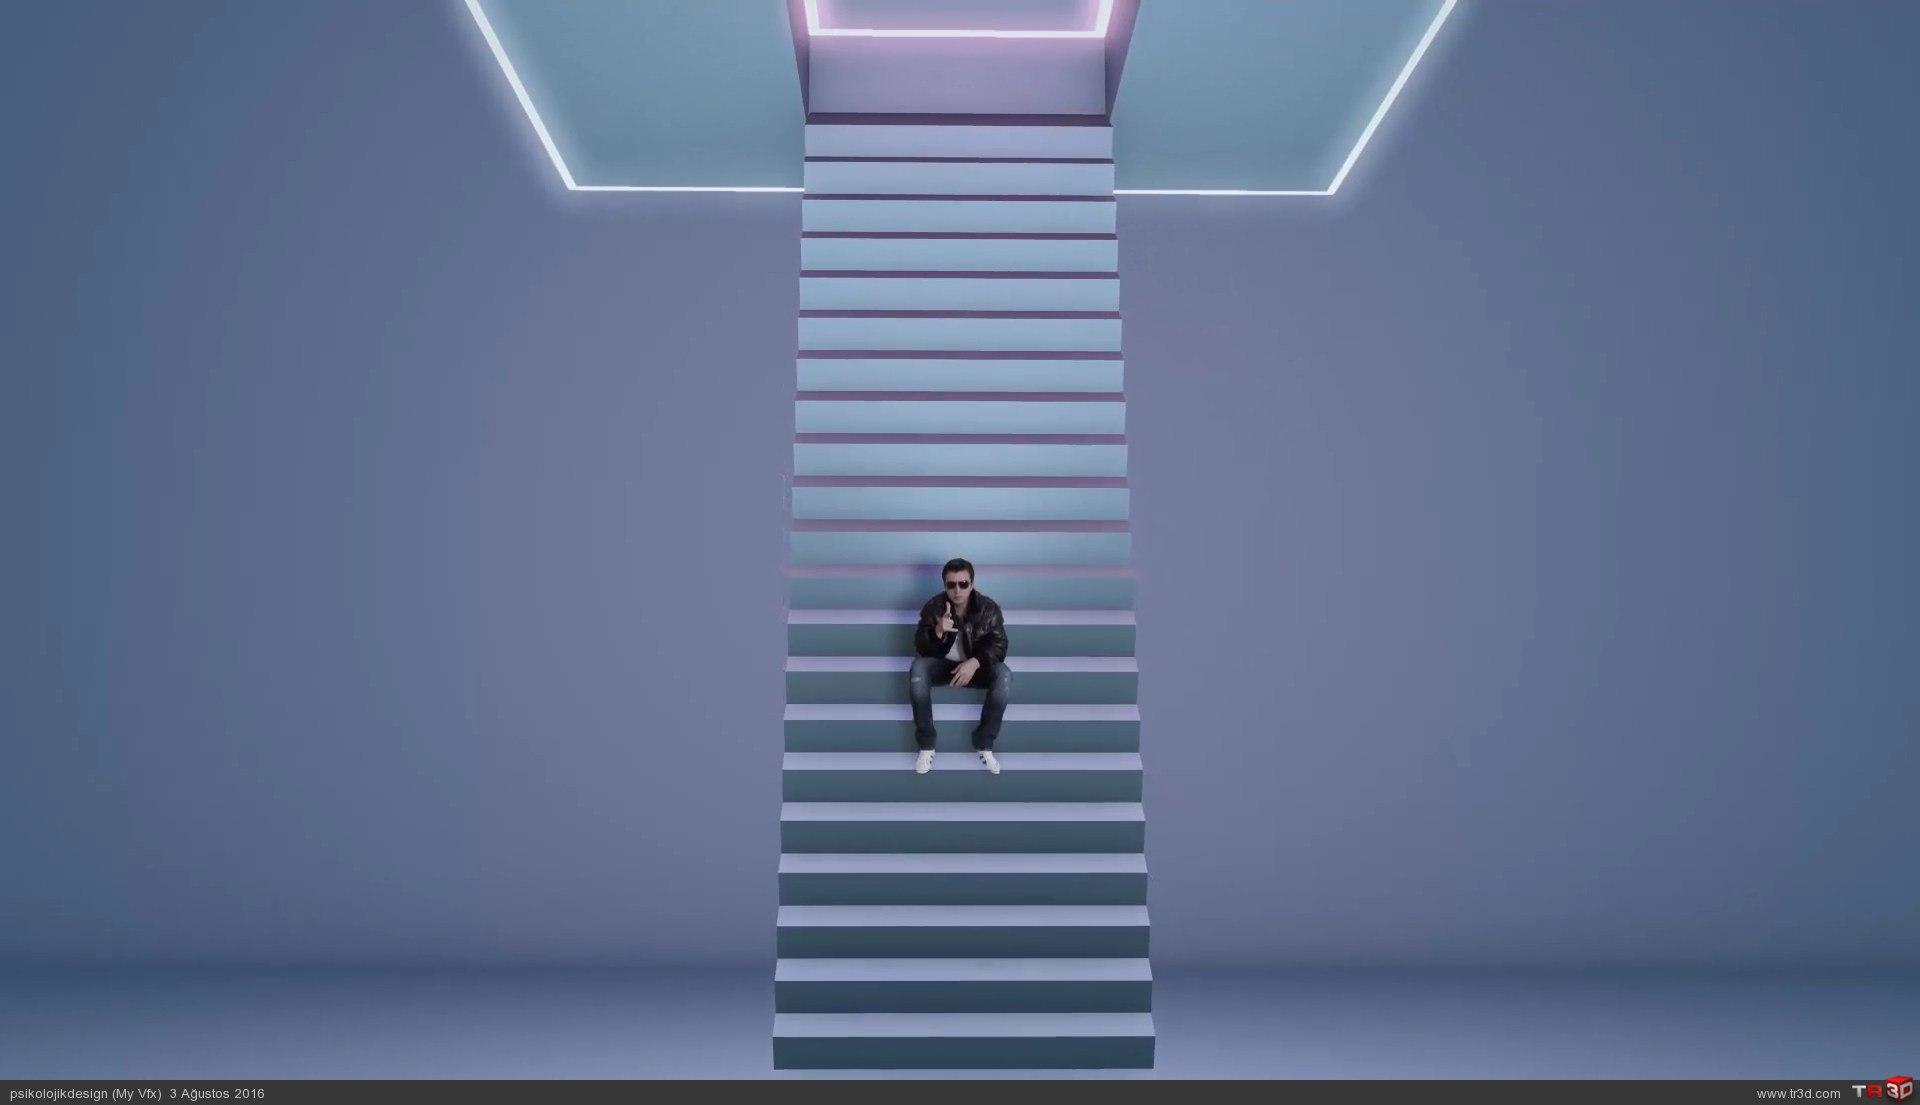 Drake Hotline Bling & Myvfx Karşılaştırma   After Effects - Cinema 4d Klip Yapım Dersi  5